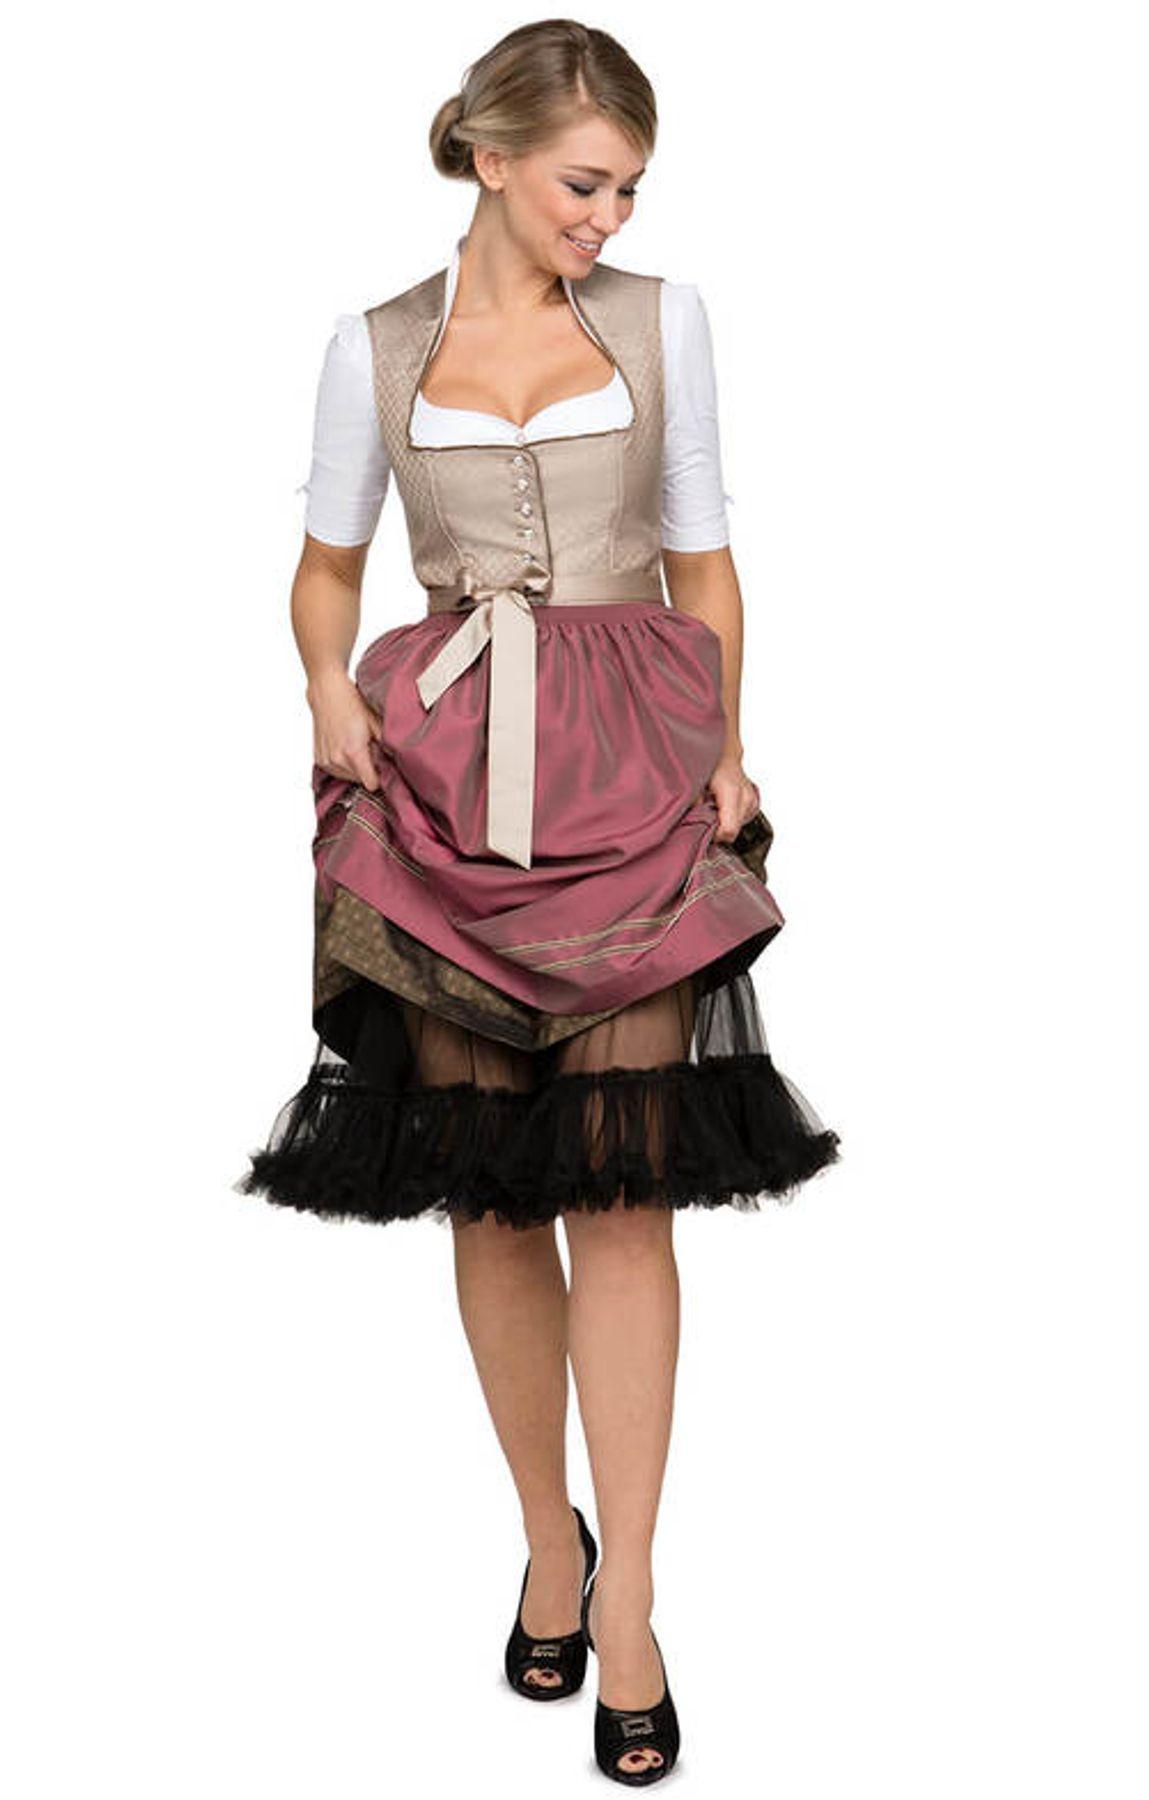 Stockerpoint - Trachten Dirndl Petticoats 60cm, U-90 – Bild 5